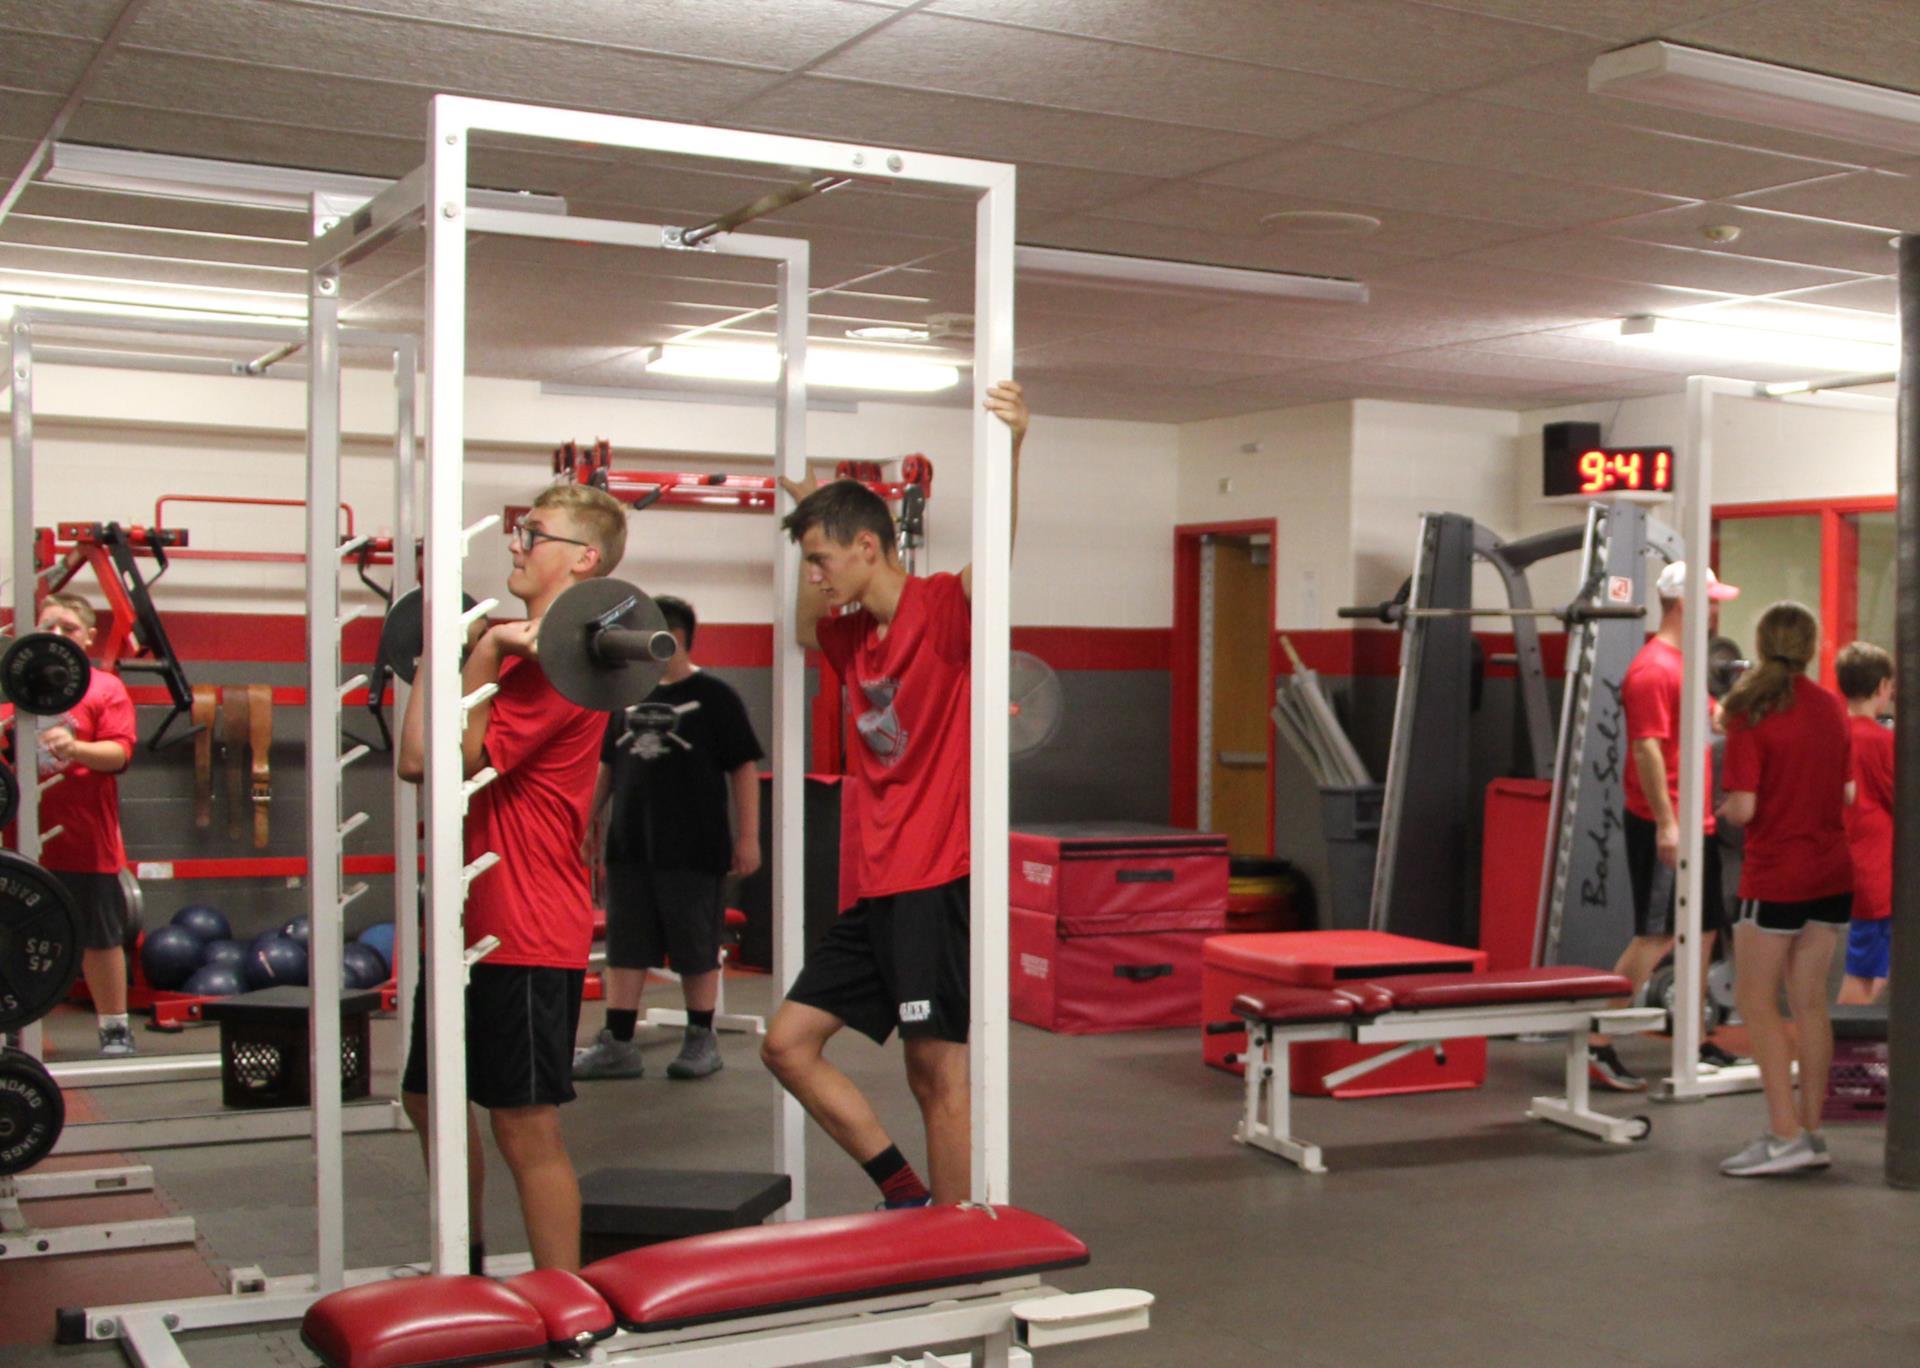 wide shot of weight room